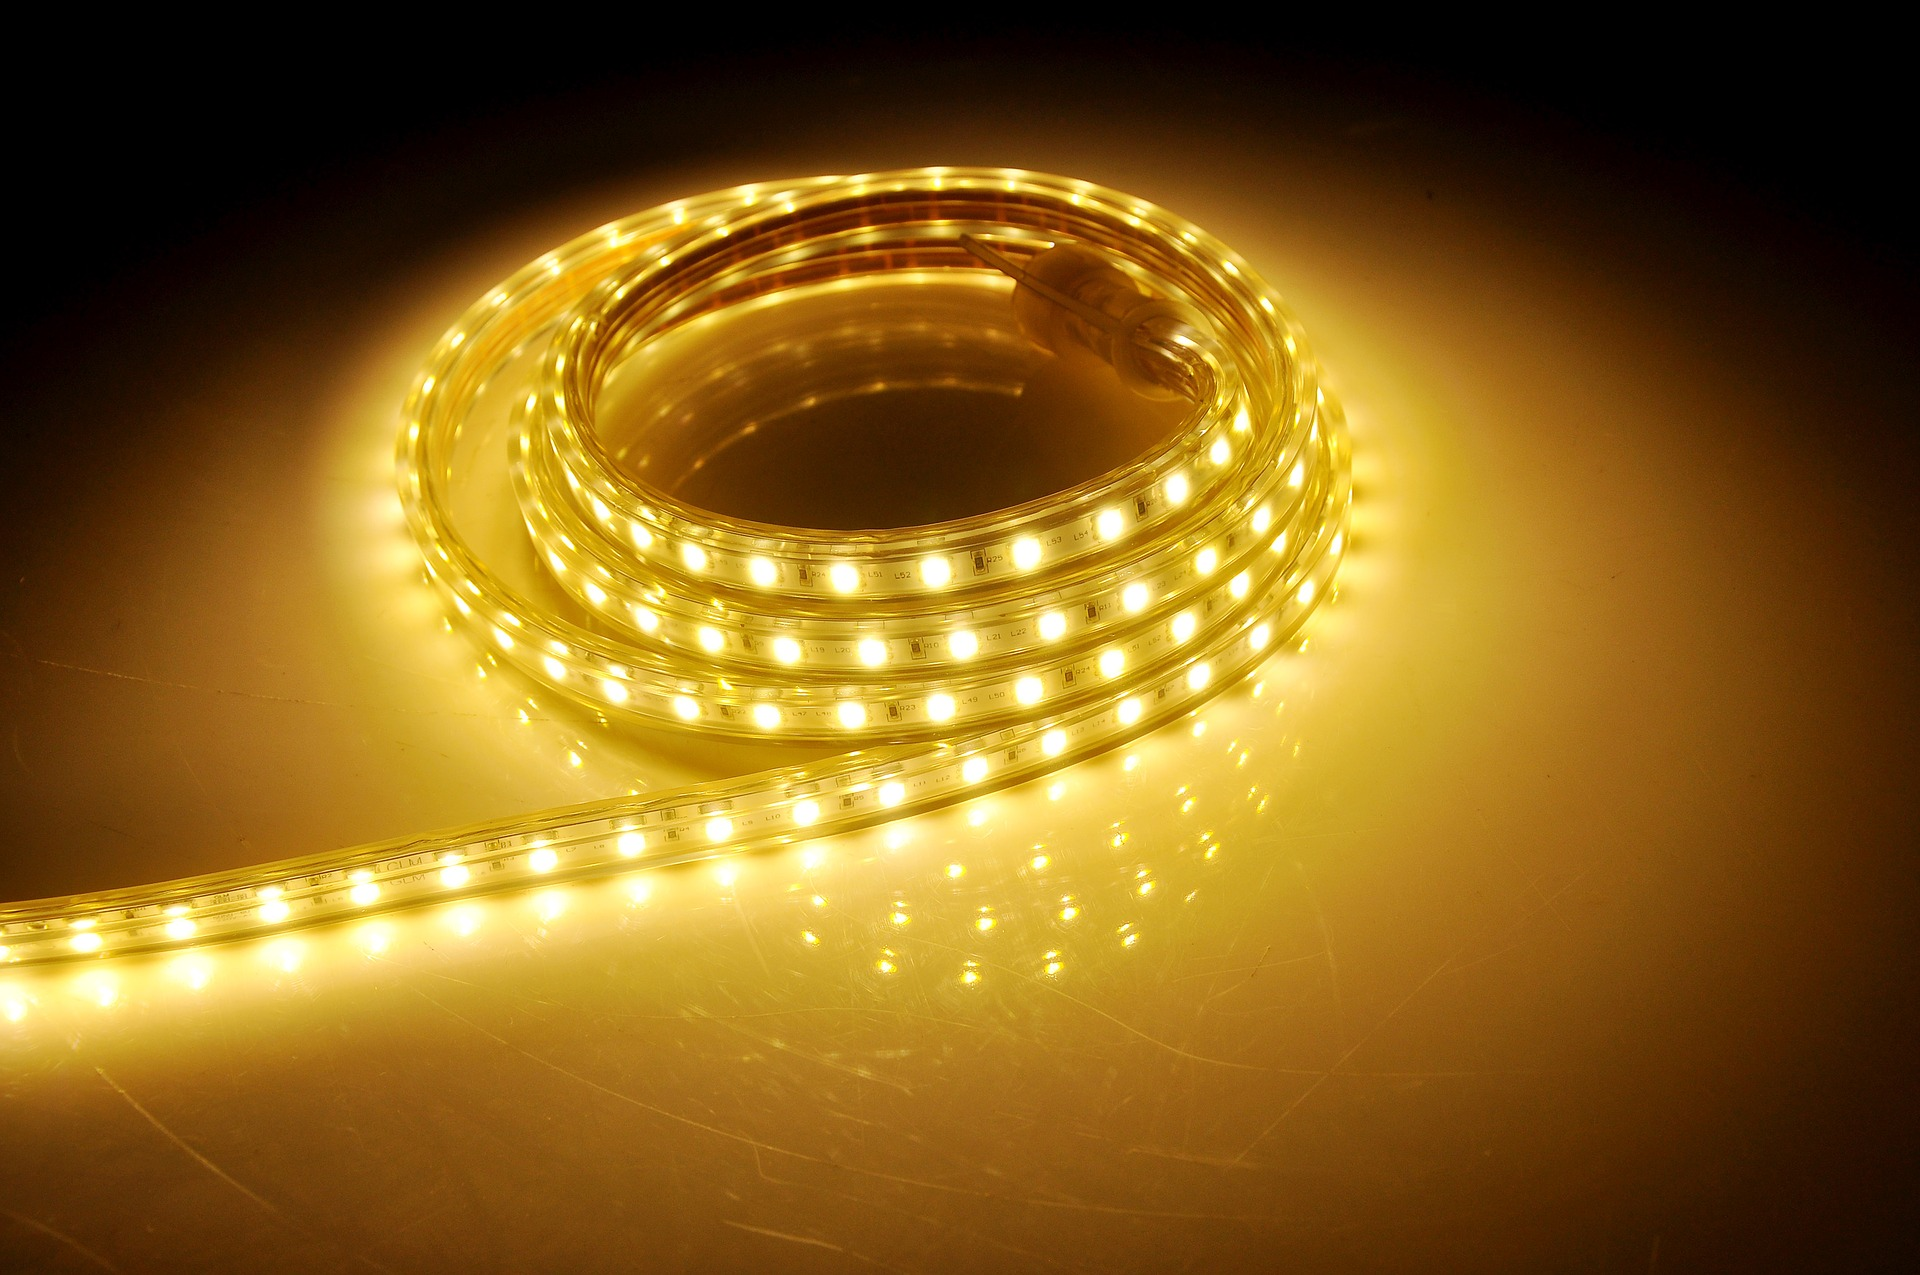 Een droominterieur met led strips #rgbledstrip #ledstrip #ledverlichting #interieur